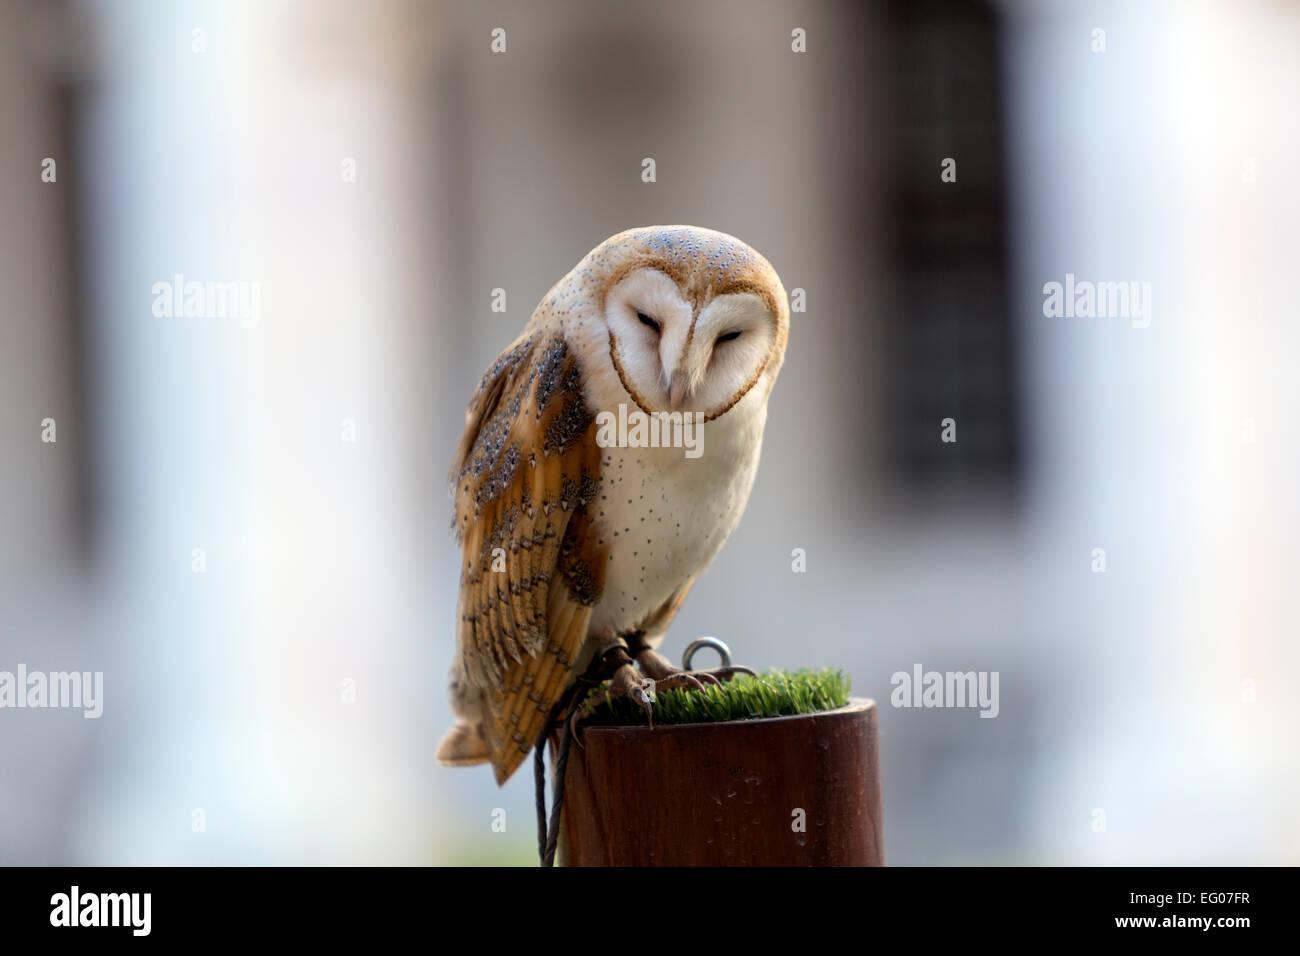 barn-owl-falconry-in-mafra-national-pala